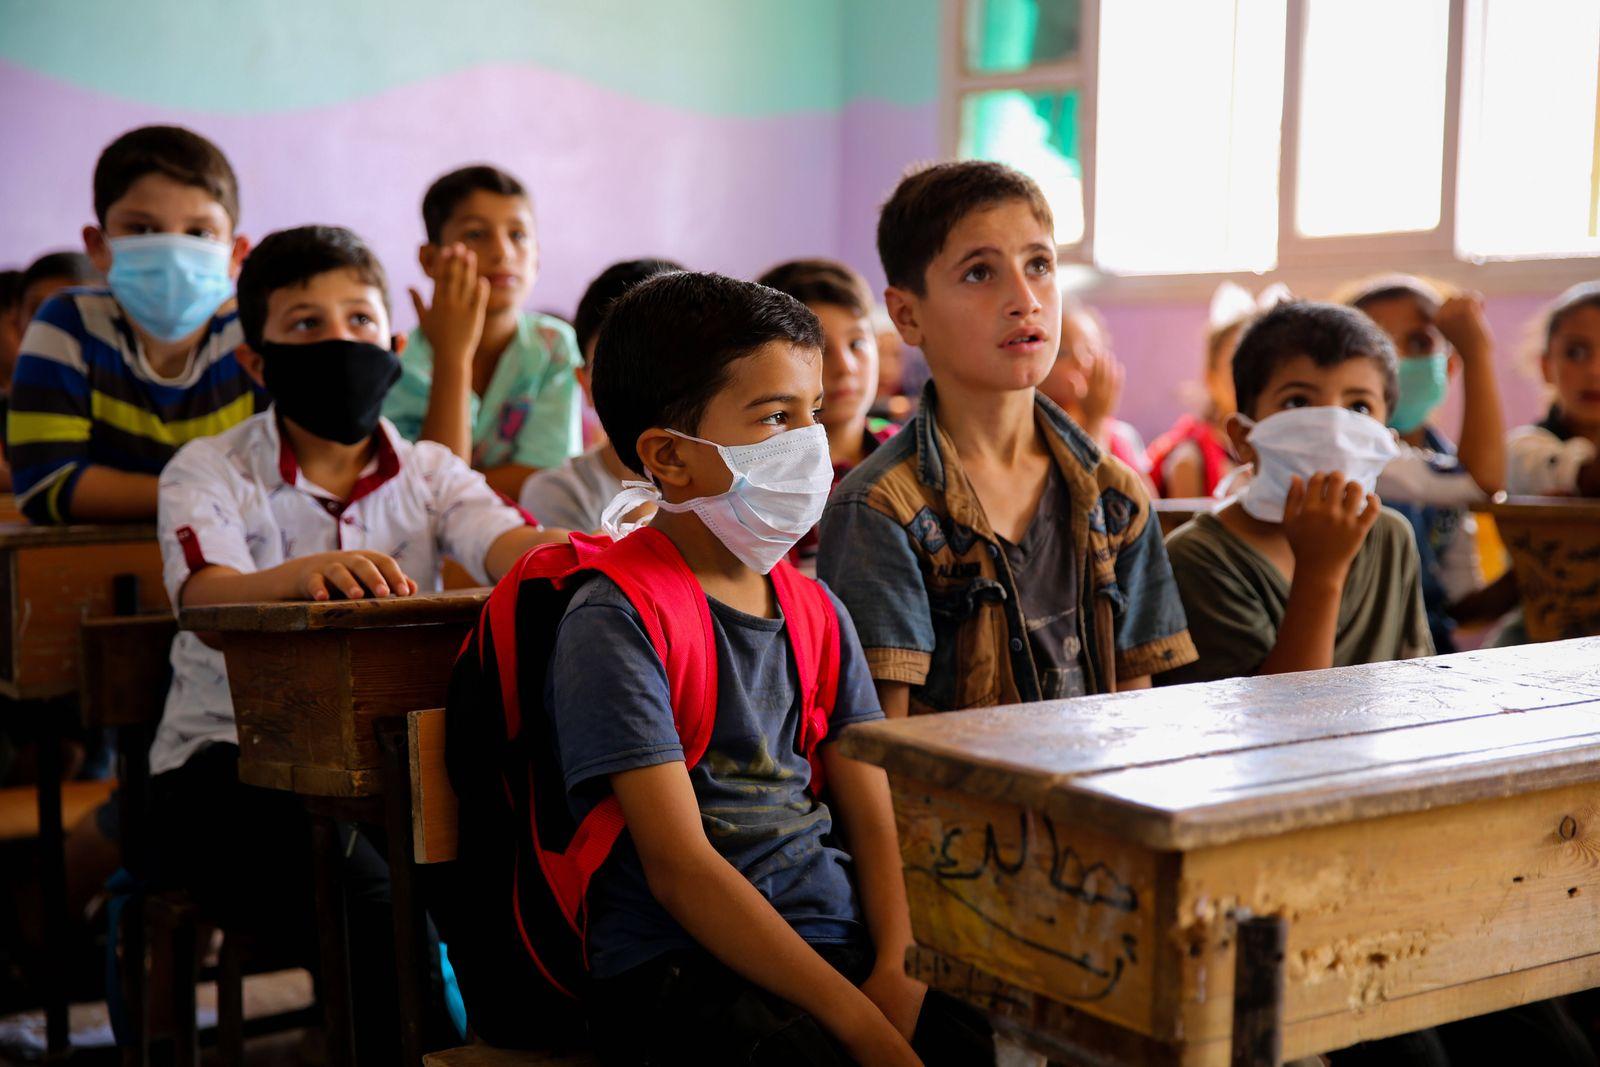 September 28, 2020: Idlib, Syria. 28 September 2020. Children return to school at the beginning of the new academic year